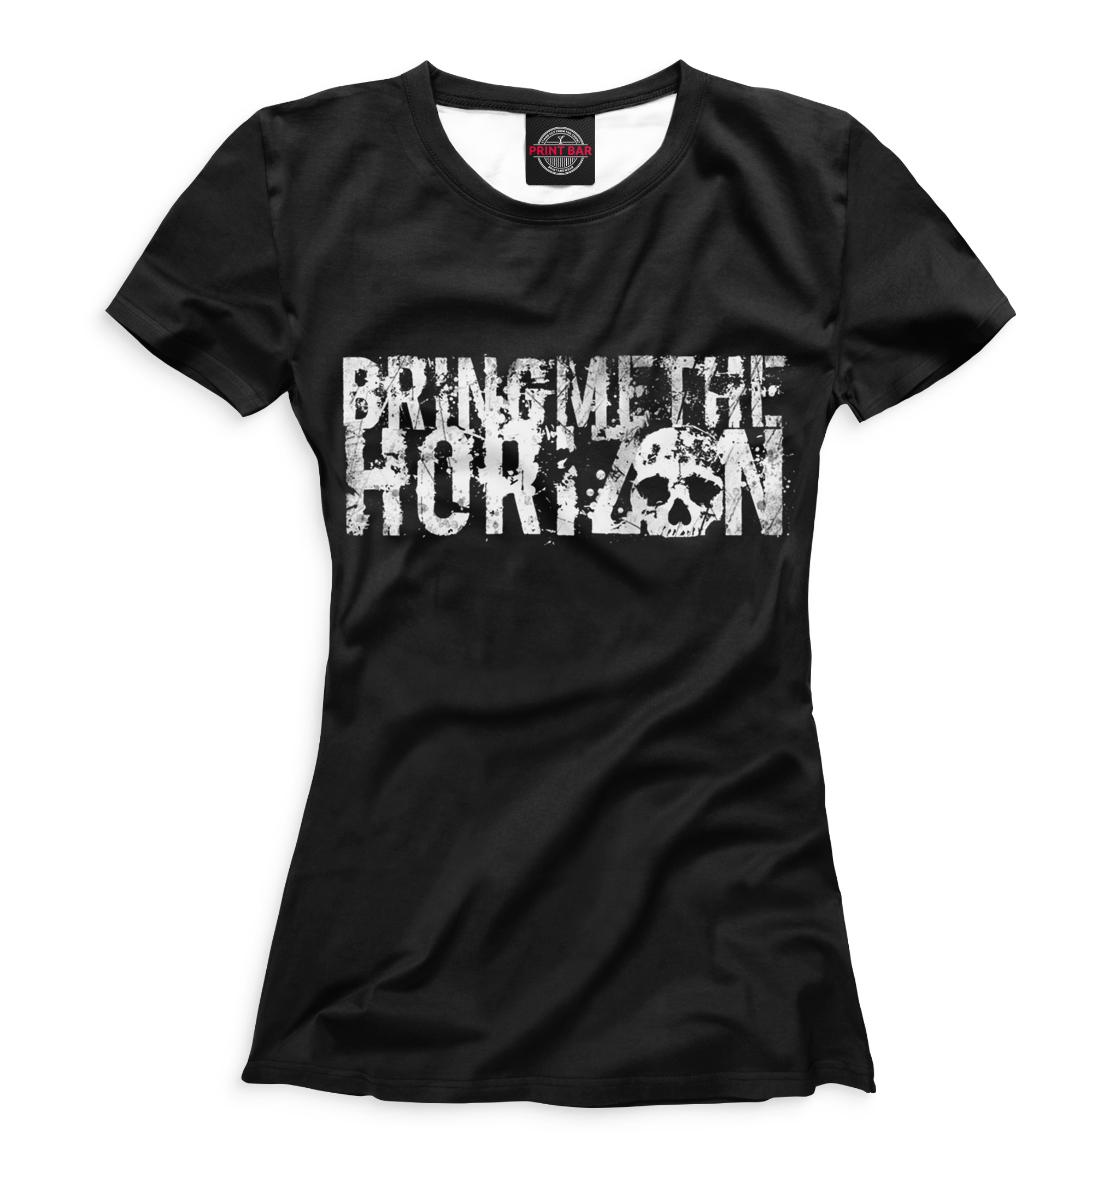 Купить Bring Me the Horizon, Printbar, Футболки, BRI-819746-fut-1